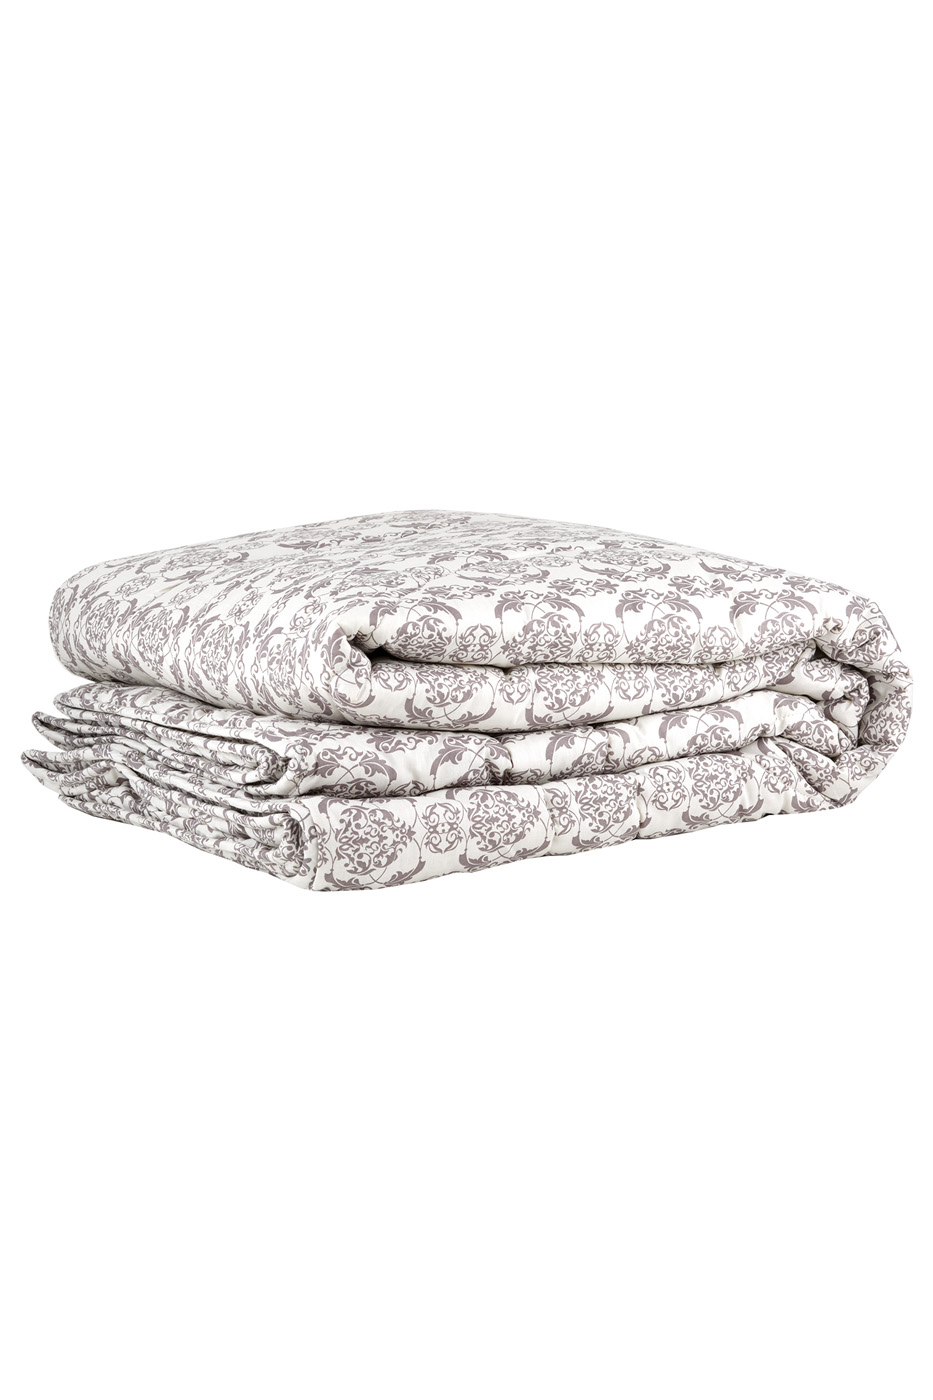 Одеяла CLASSIC by T Одеяло Софт Премиум Теплое (175х200 см) одеяло classic by t верблюжья шерсть